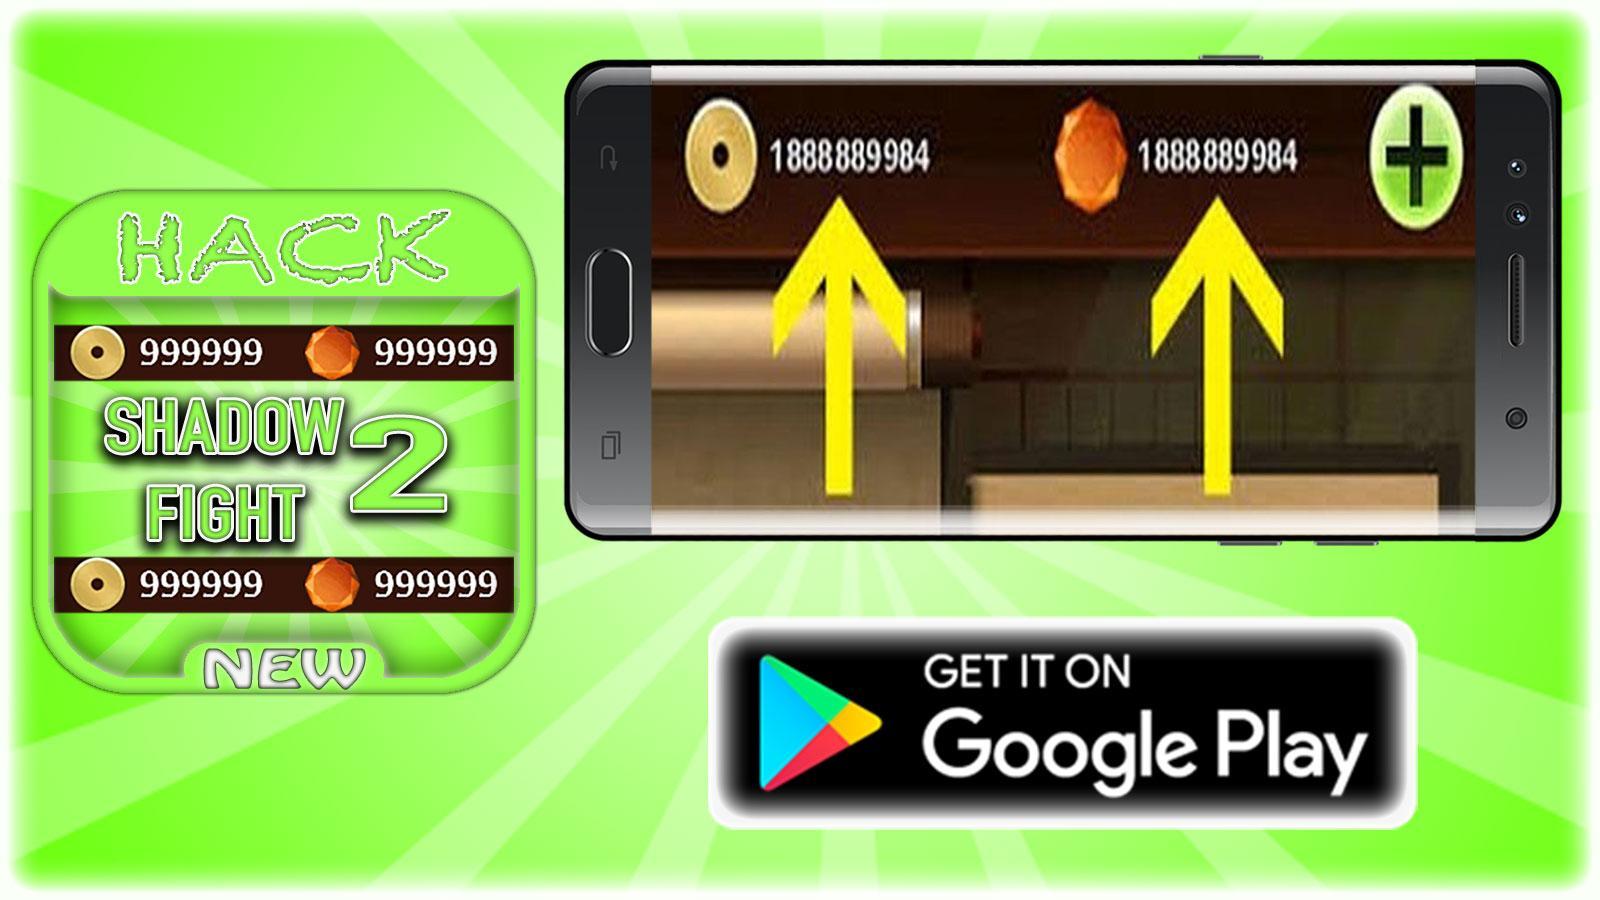 hack for shadow fight 2 game app joke prank android apps on hack for shadow fight 2 game app joke prank screenshot